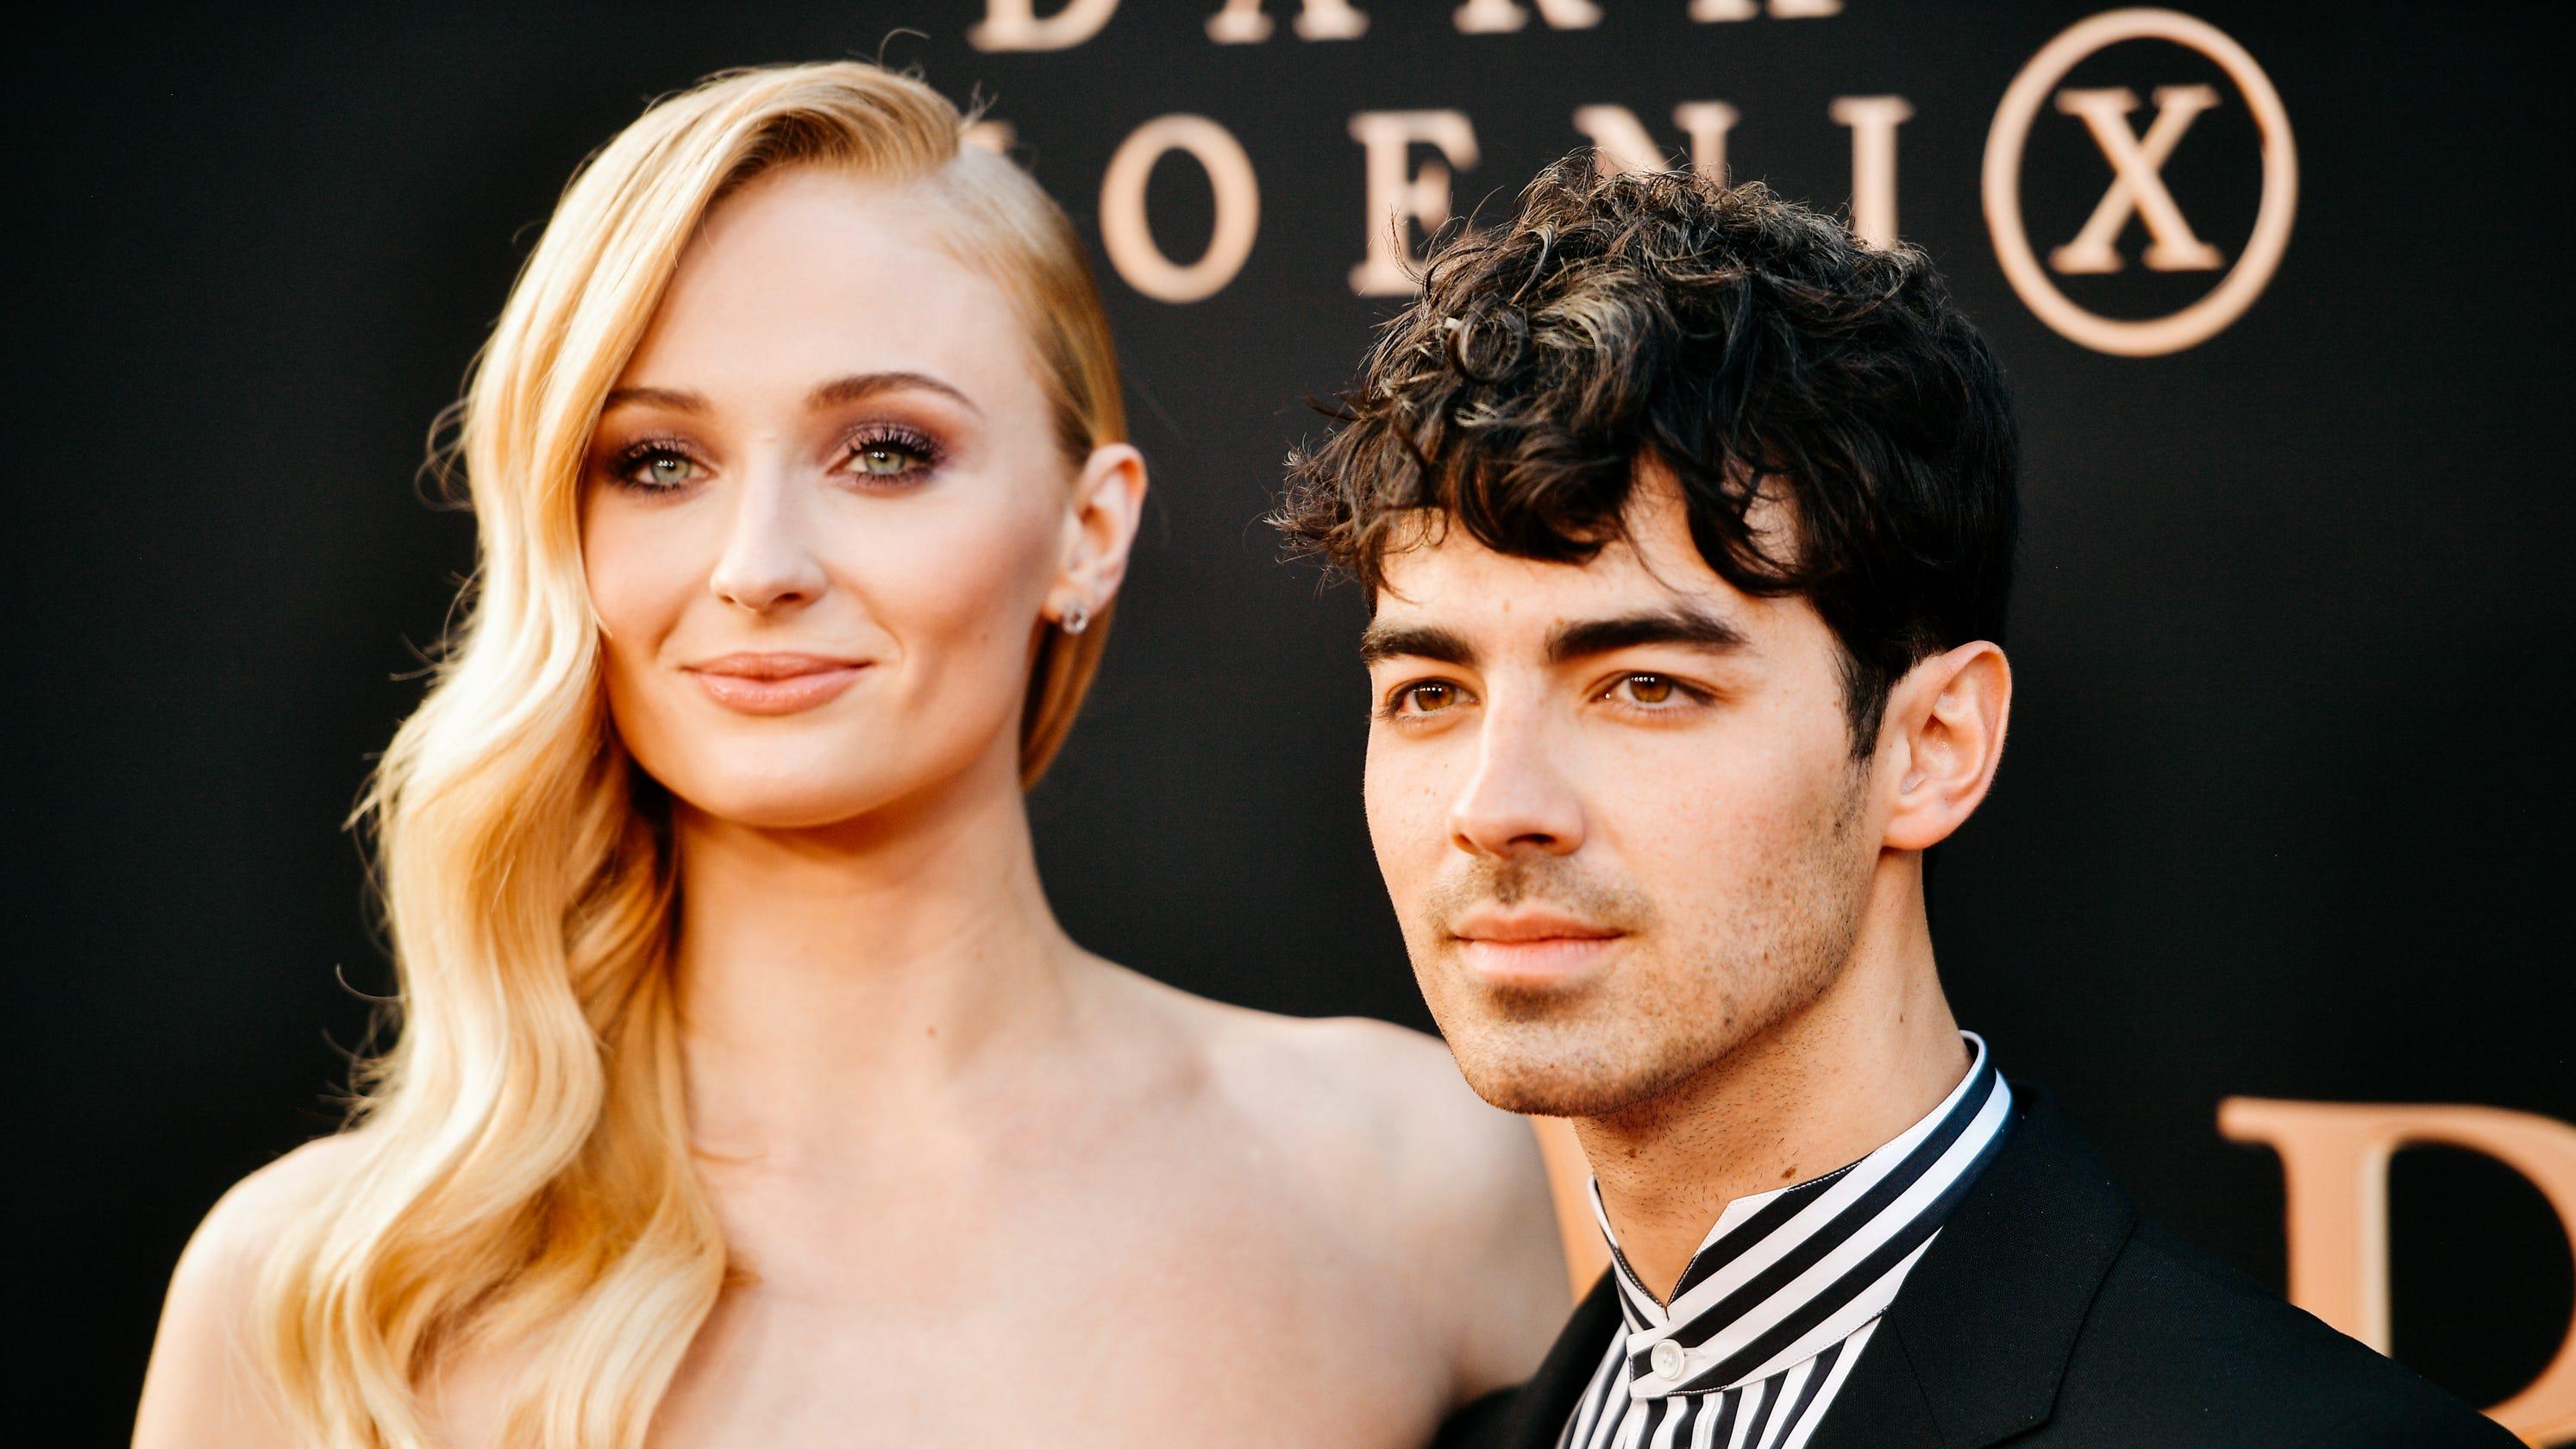 QnA VBage Joe Jonas and Sophie Turner escape to honeymoon 'paradise' in the Maldives